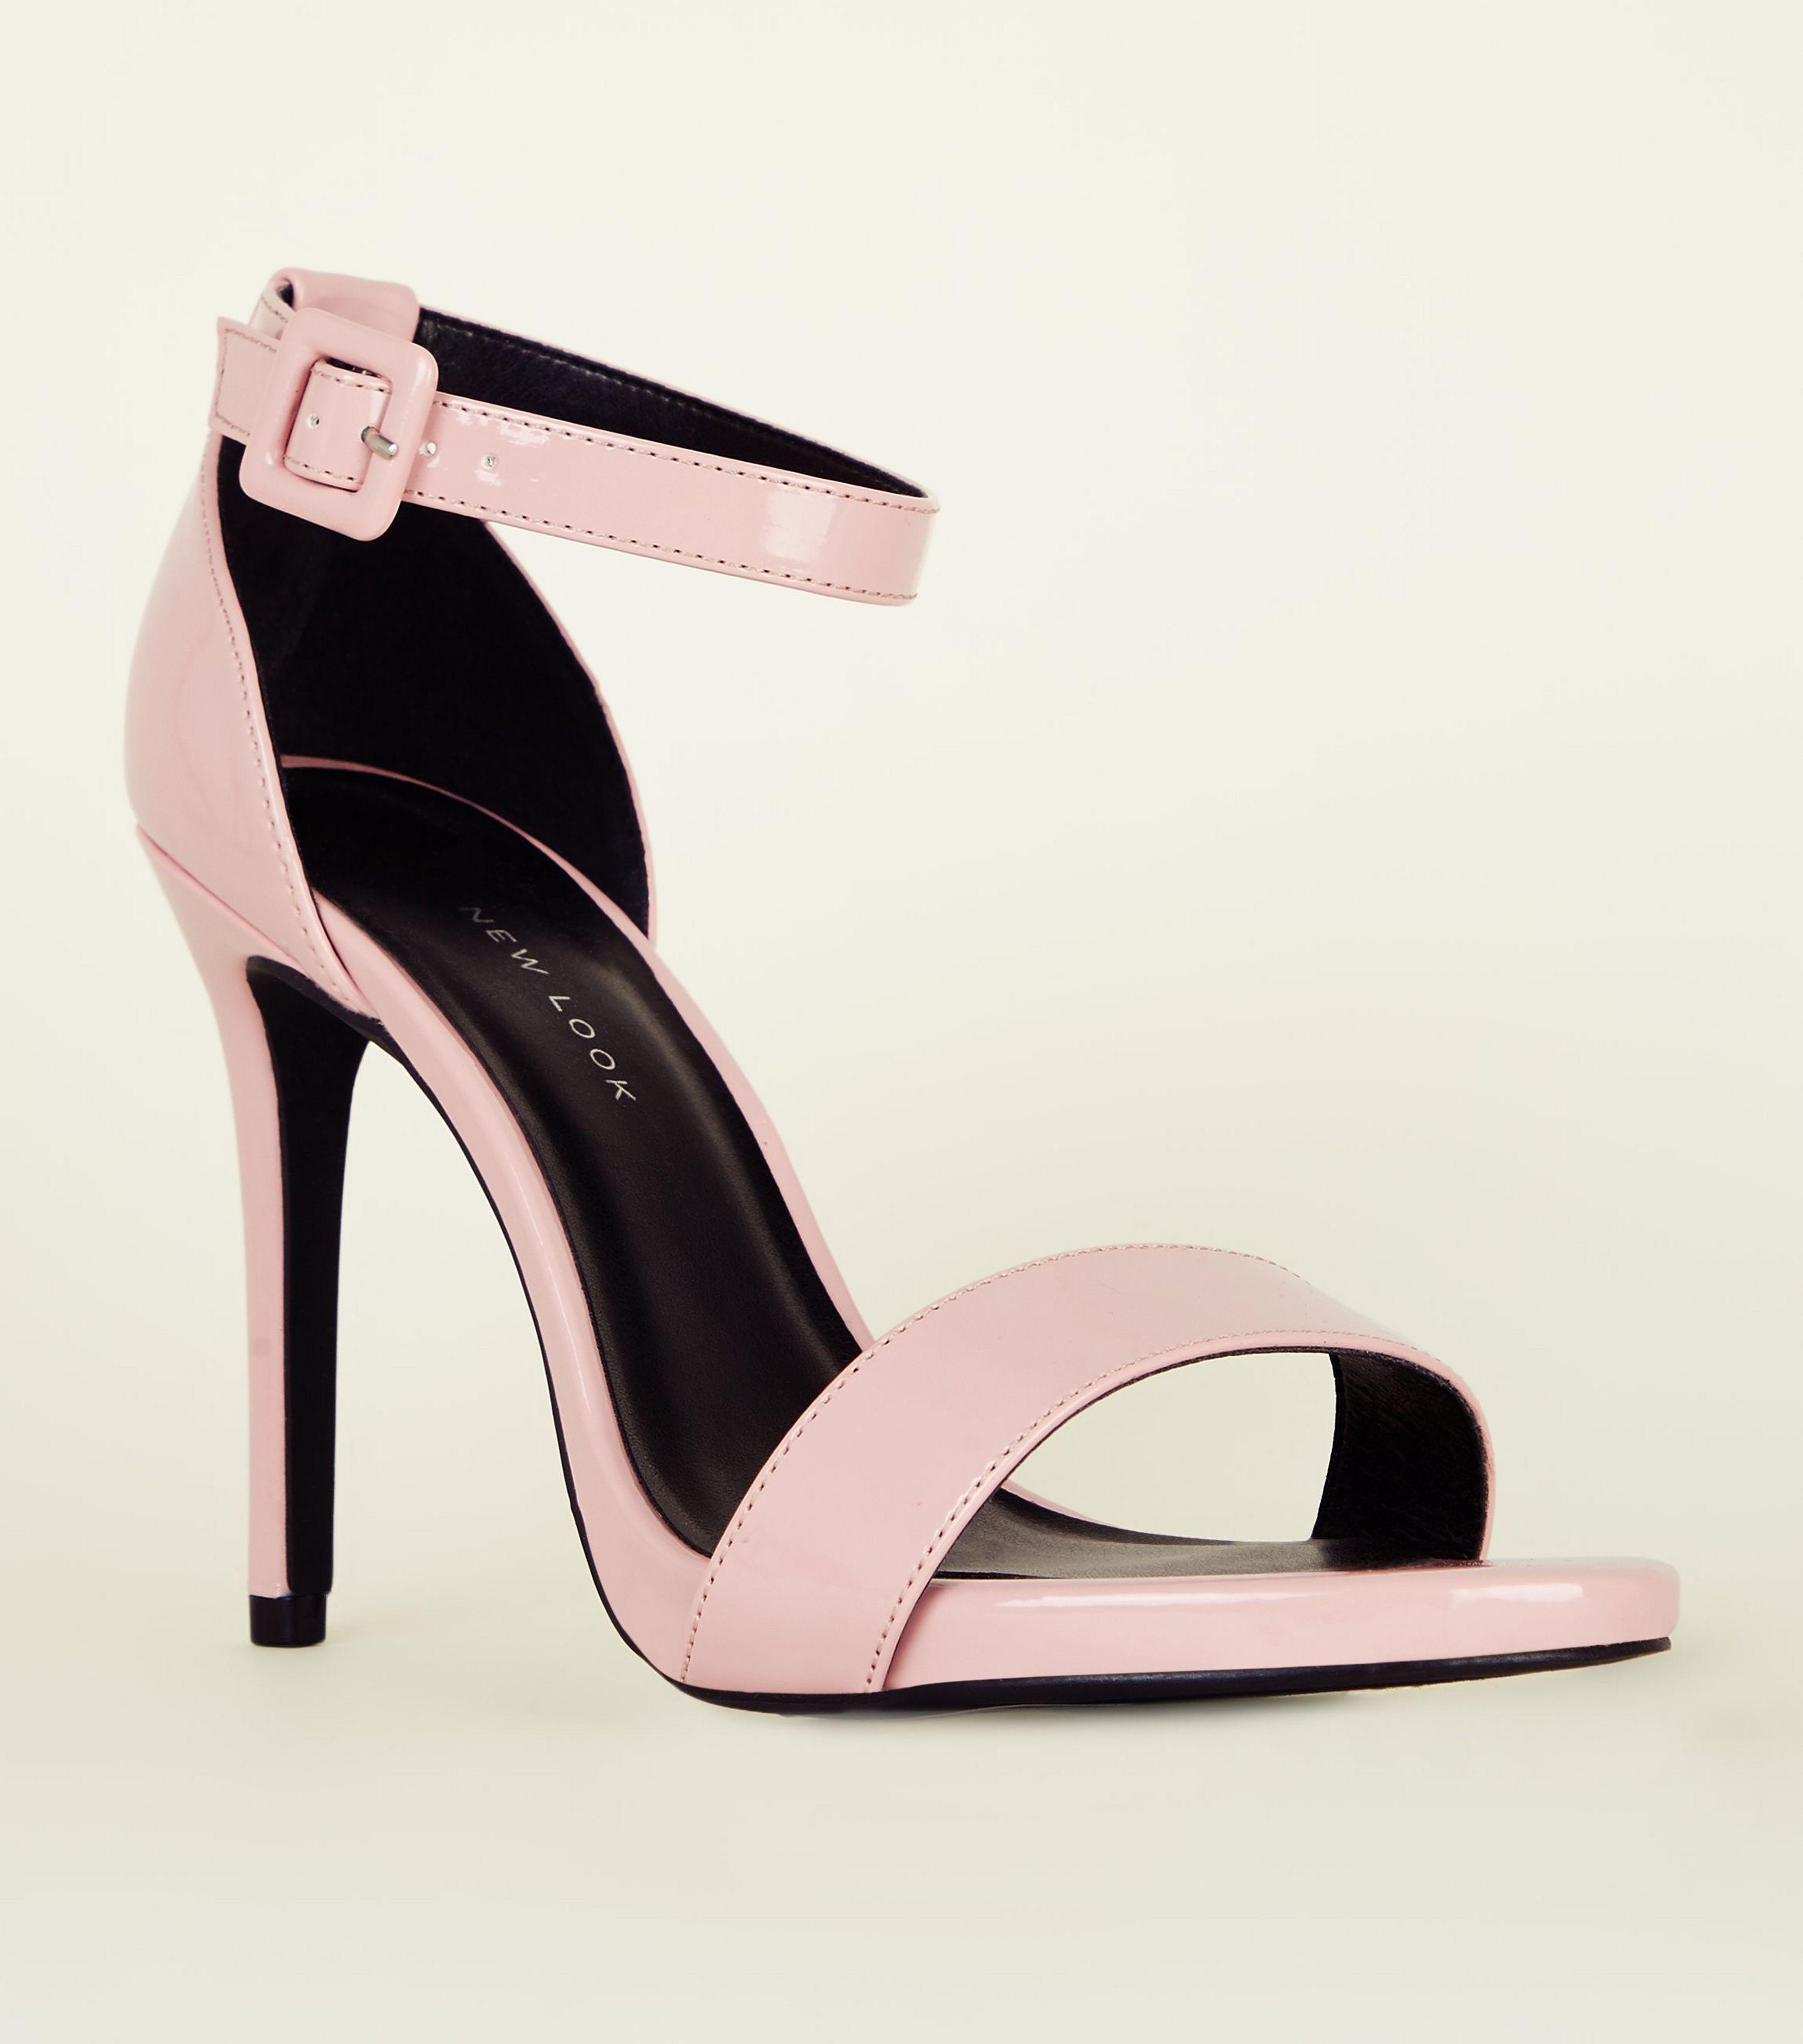 949b95569da New Look Wide Fit Pink Patent Stiletto Heels in Pink - Lyst